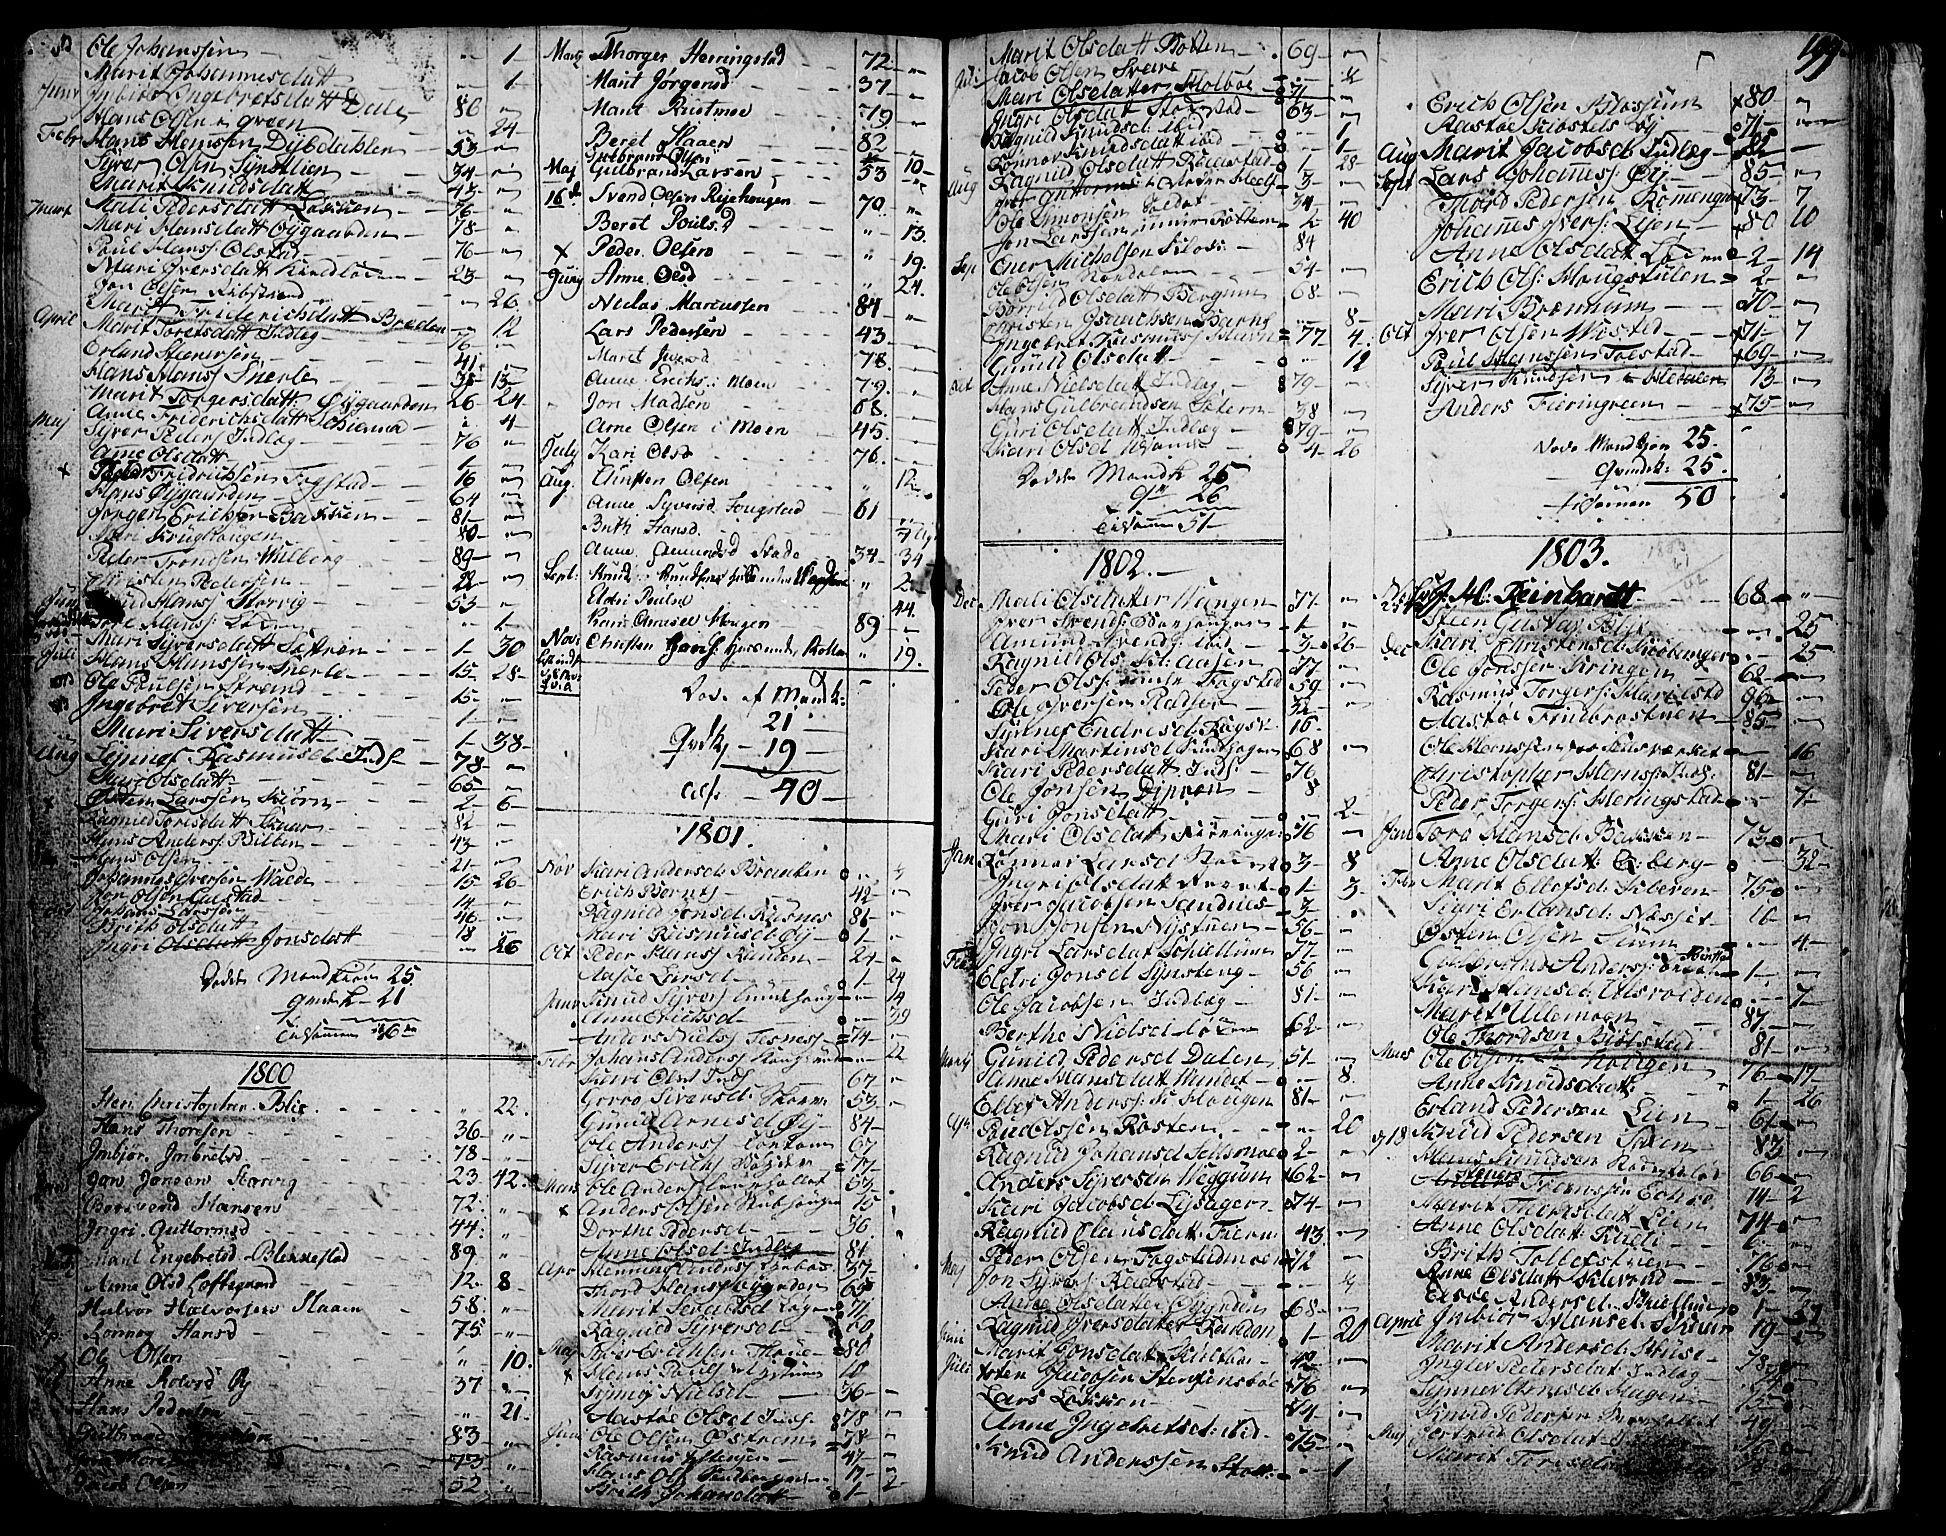 SAH, Vågå prestekontor, Ministerialbok nr. 1, 1739-1810, s. 199